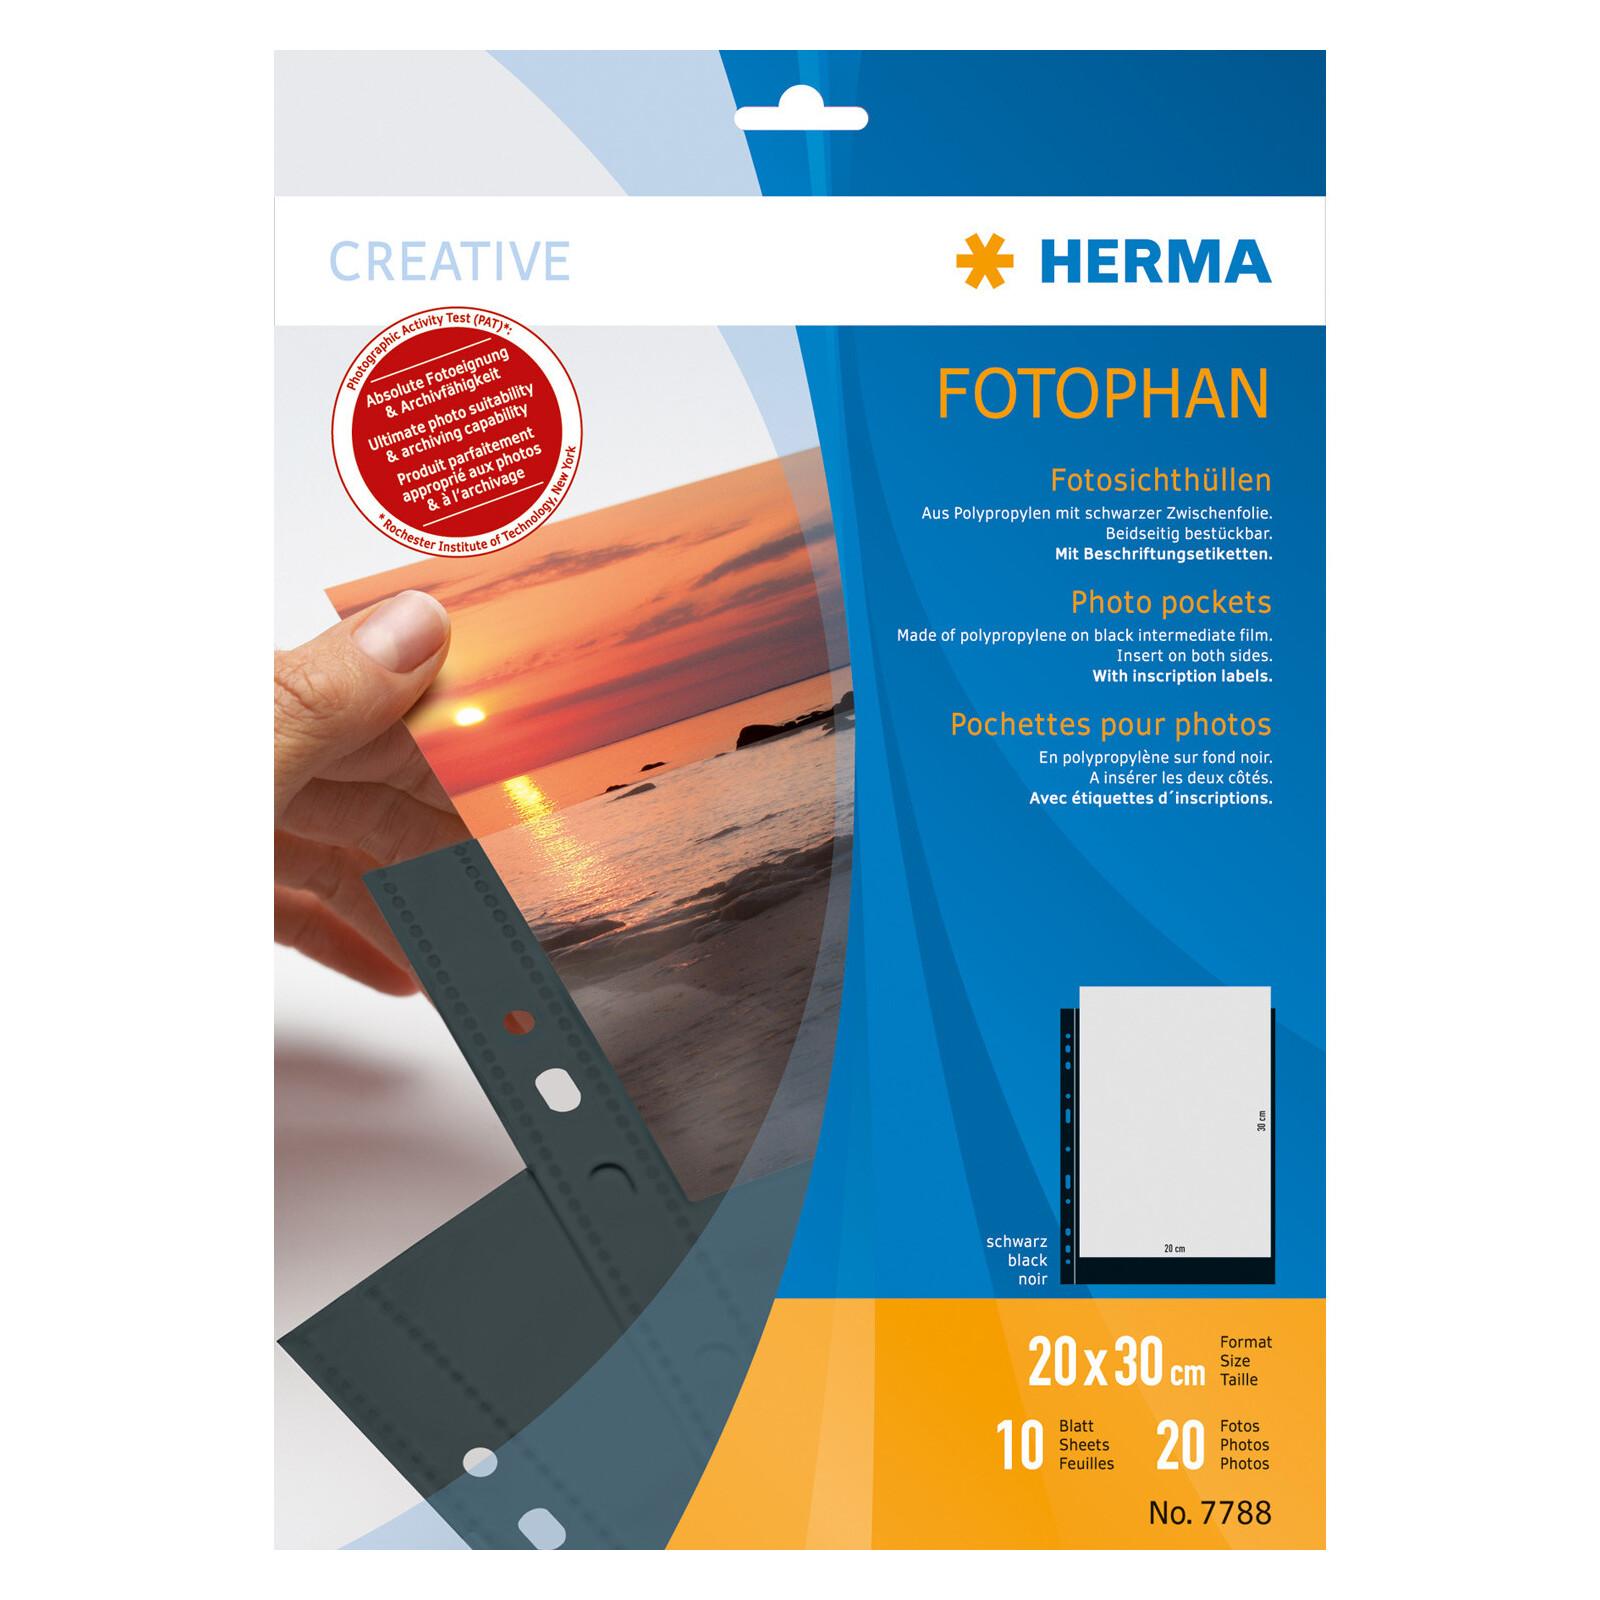 Herma 7788 Fotophan 20x30 schwarz